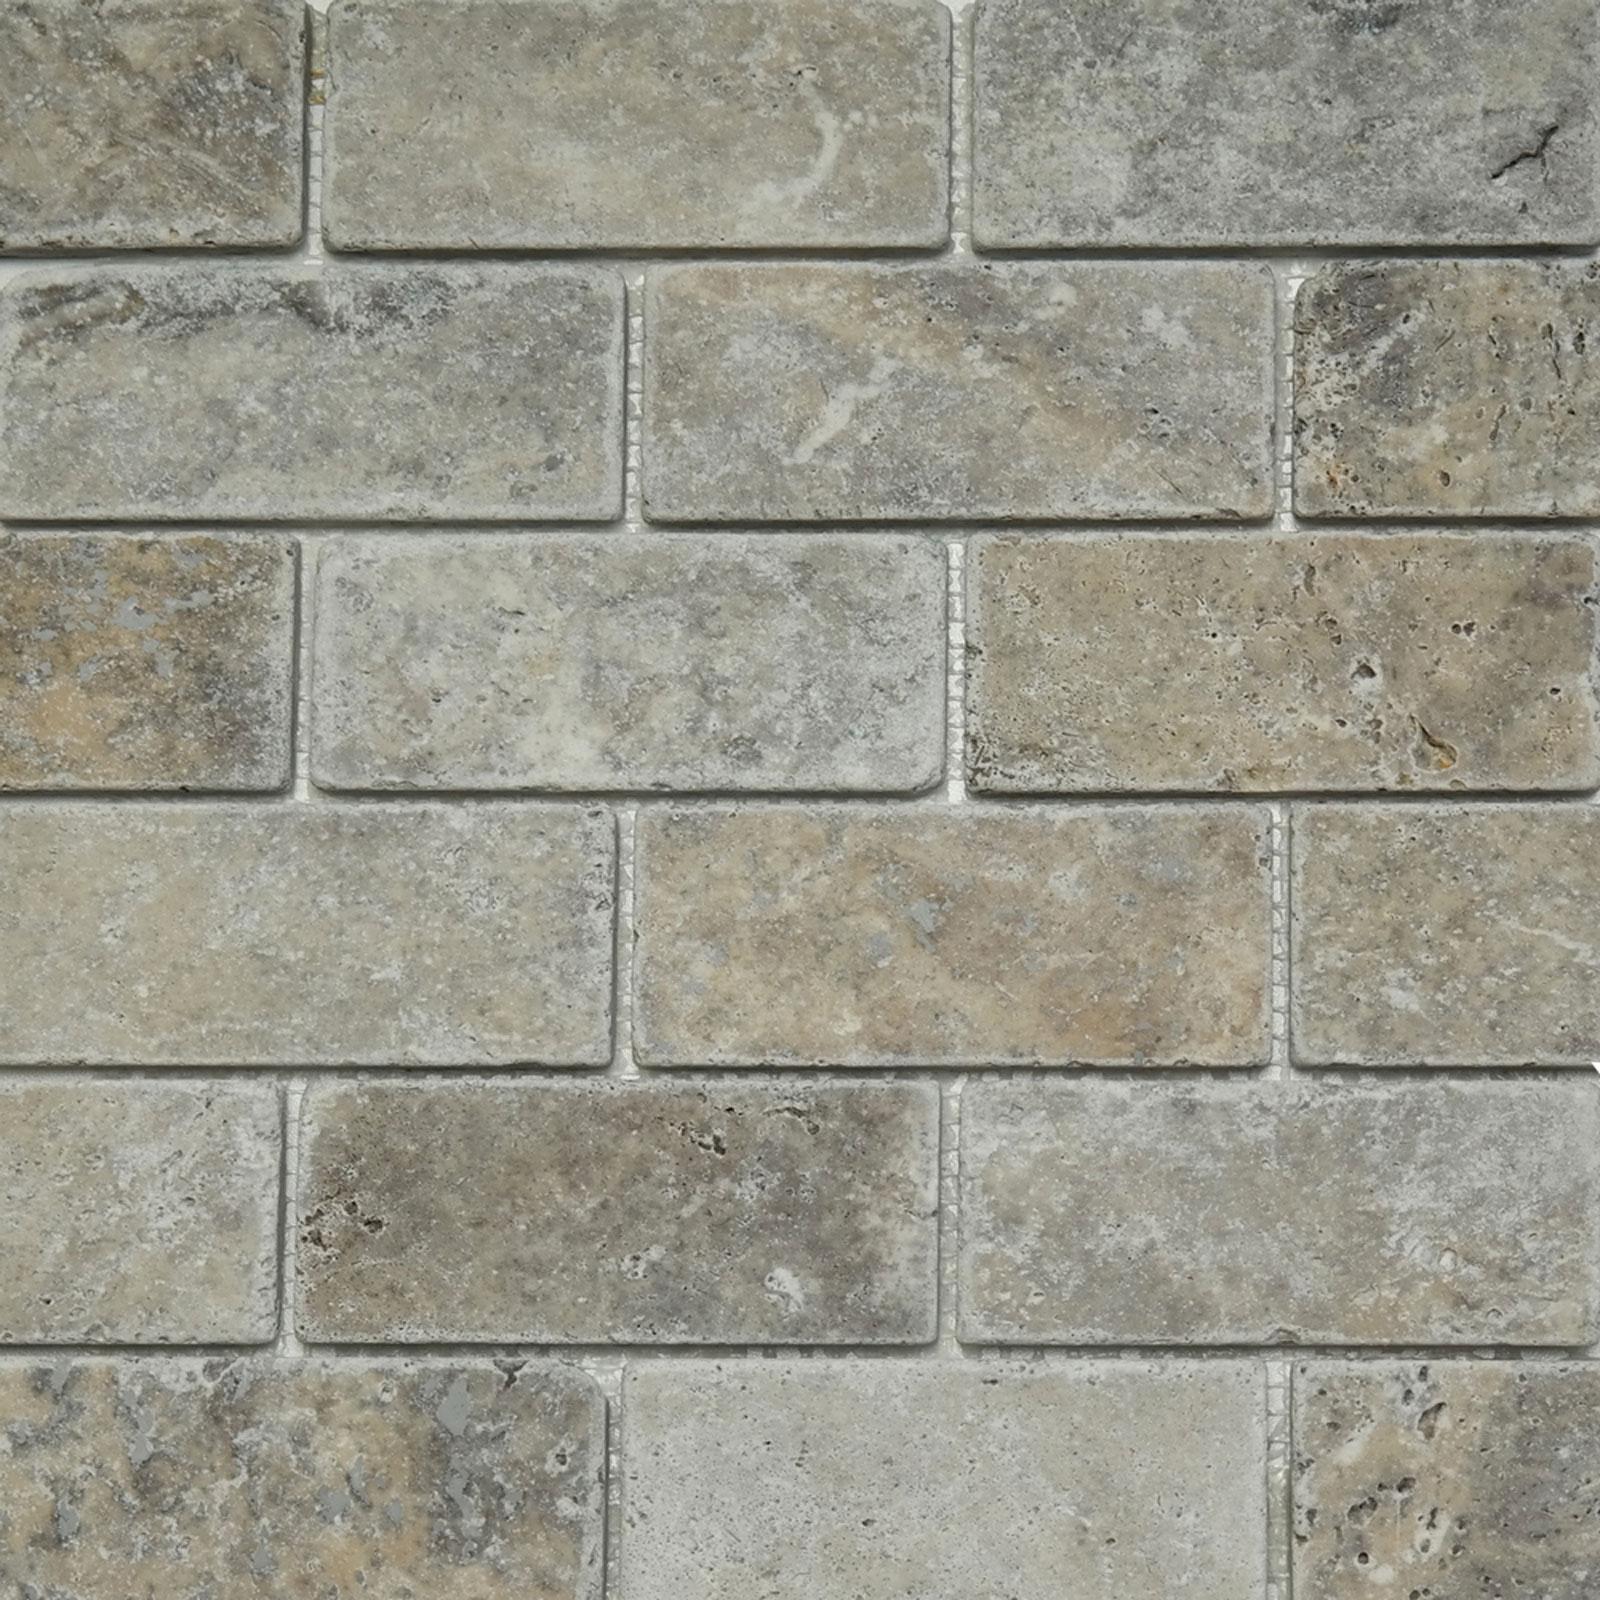 2 X 4 Mosaic Tile Silver Travertine Tumbled Honed